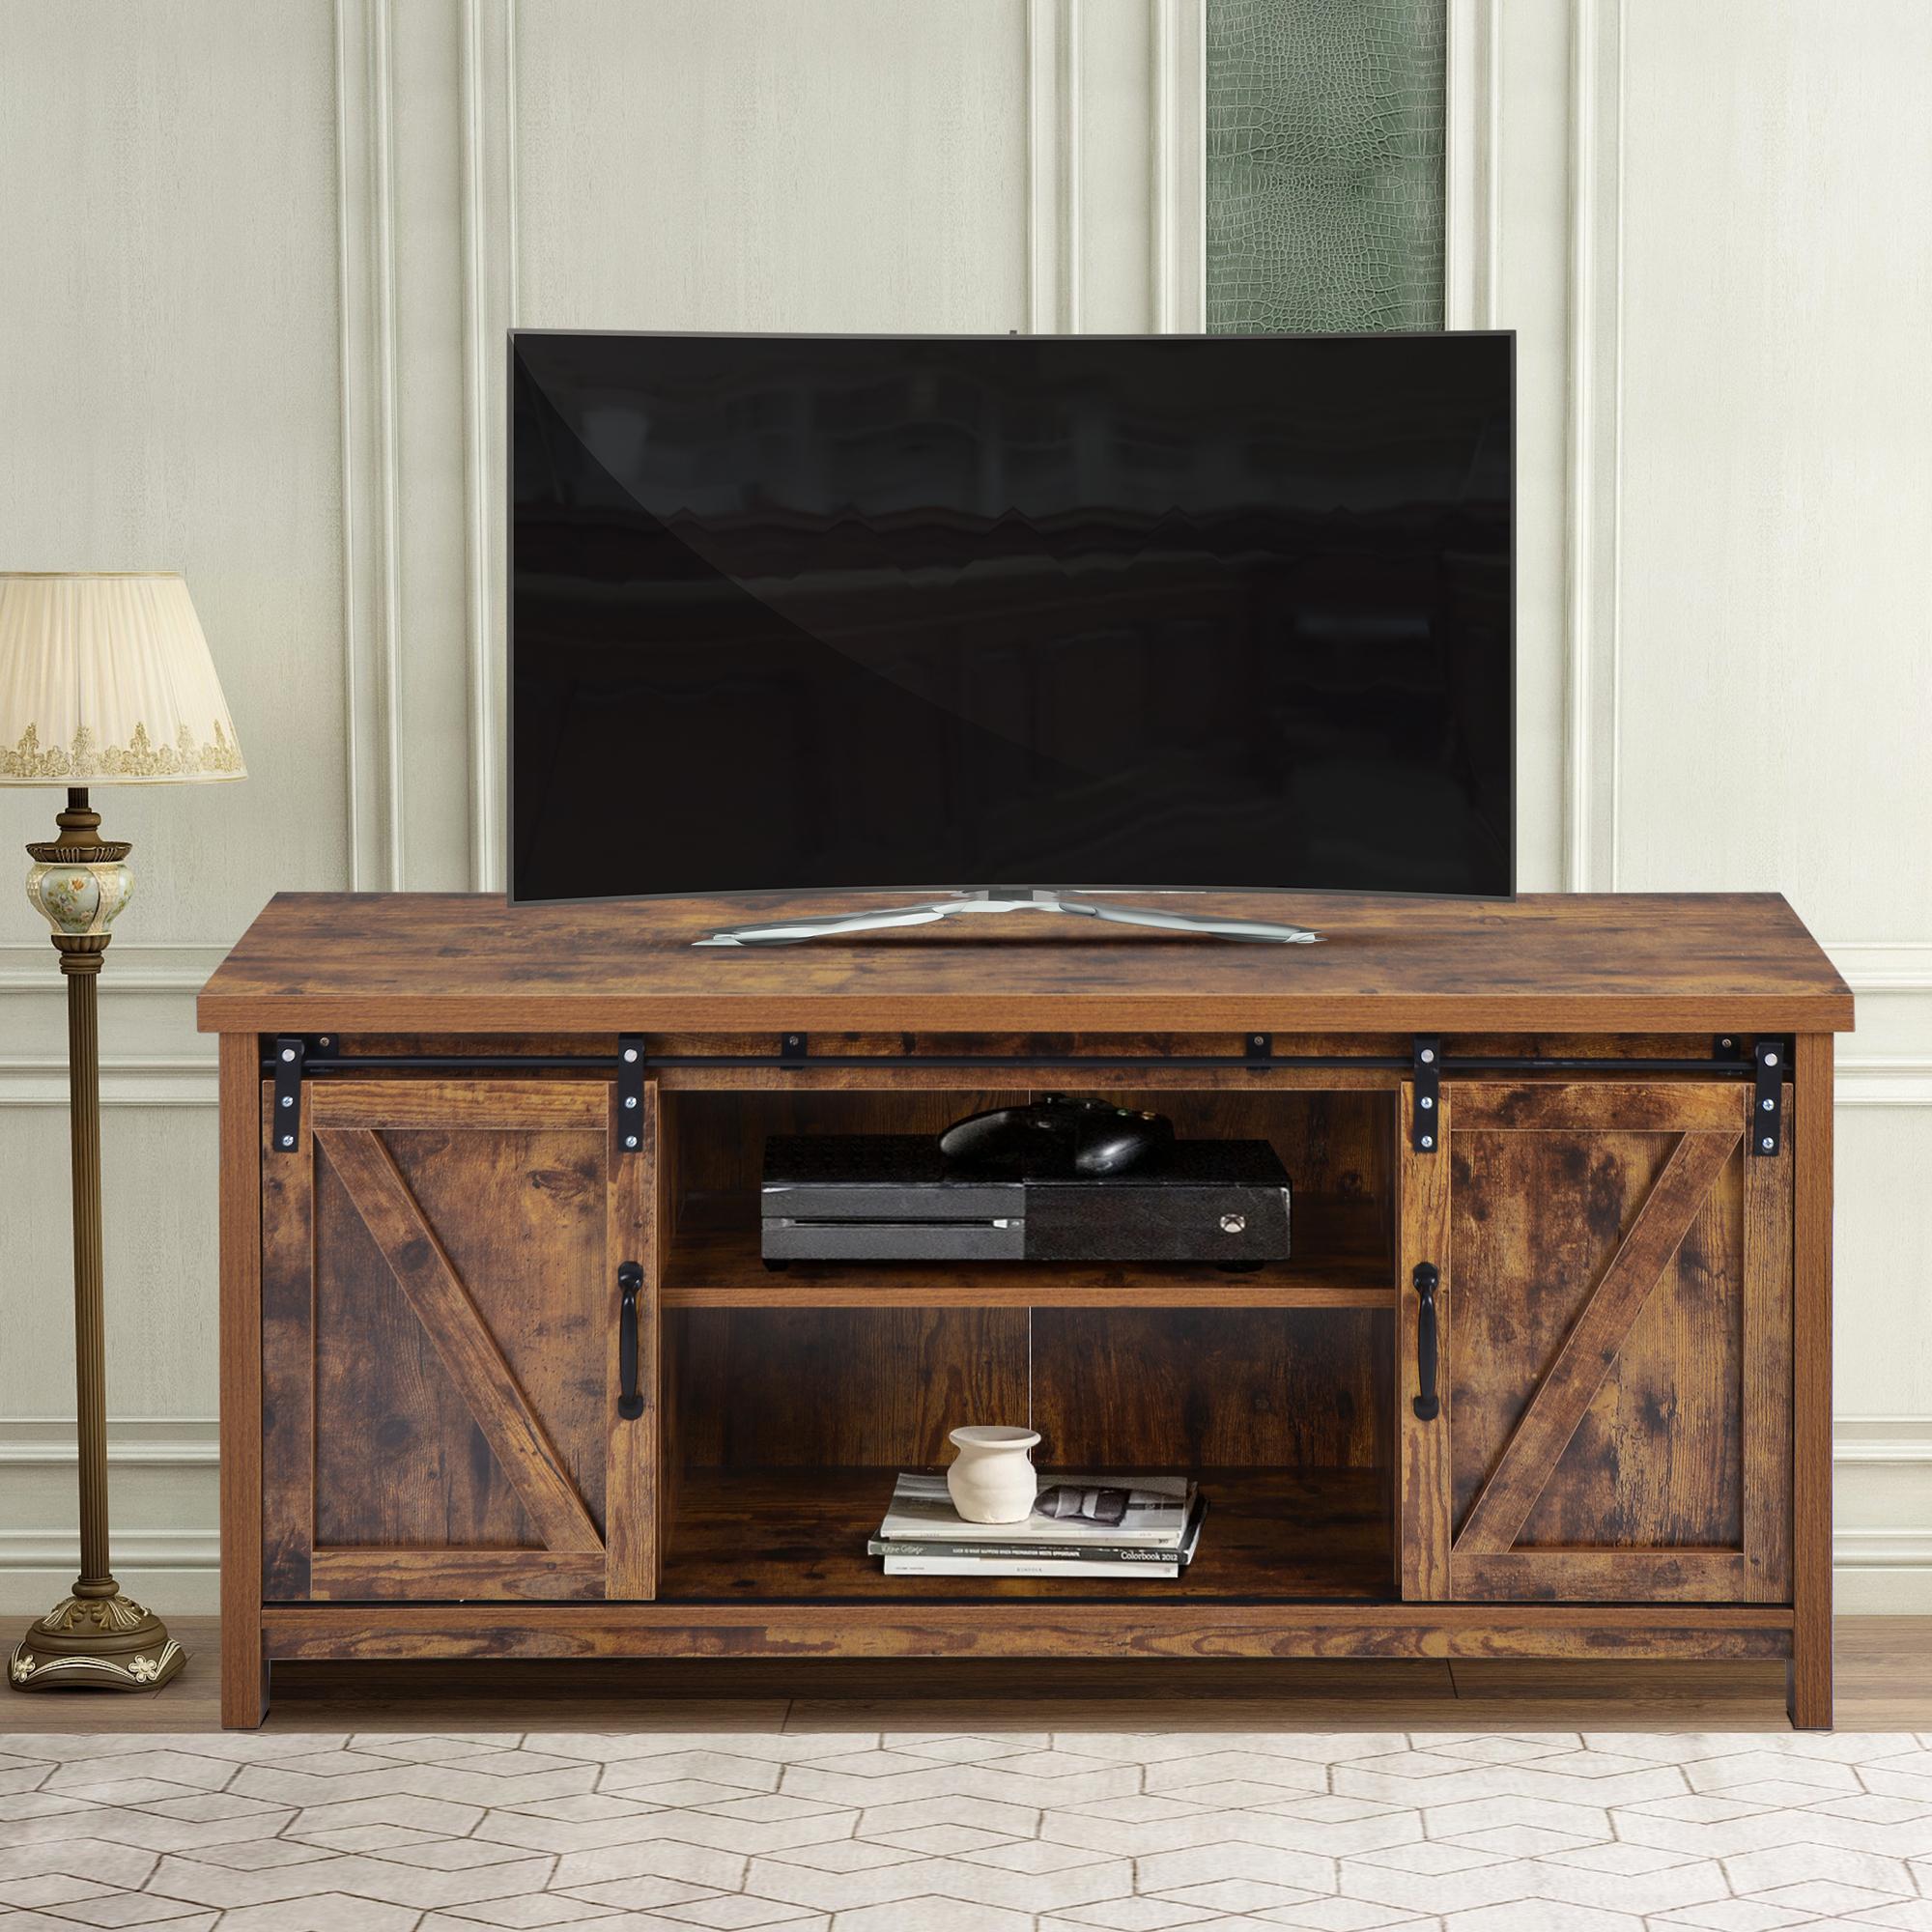 Urhomepro Corner Tv Stand, Modern Farmhouse Barn Door Tv Pertaining To Wooden Tv Stands With Doors (View 6 of 15)